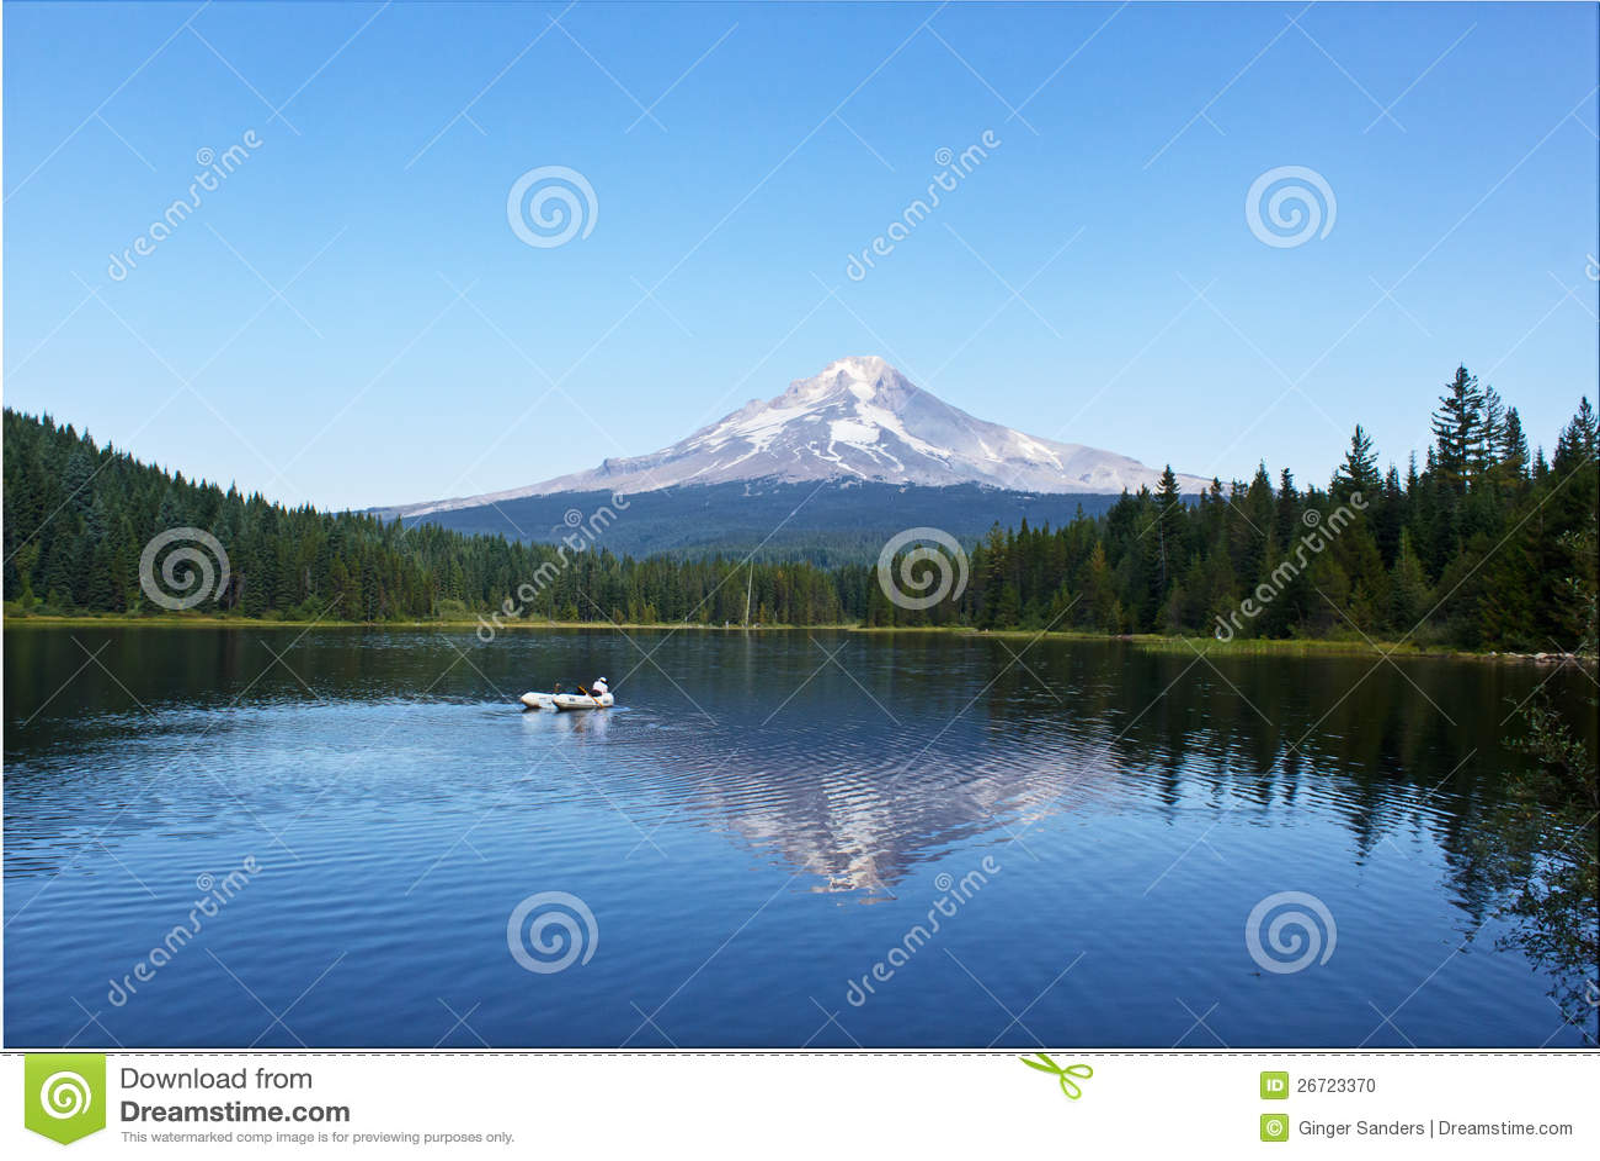 Fishing on trillium lake oregon stock photo image 26723370 for Fish lake oregon